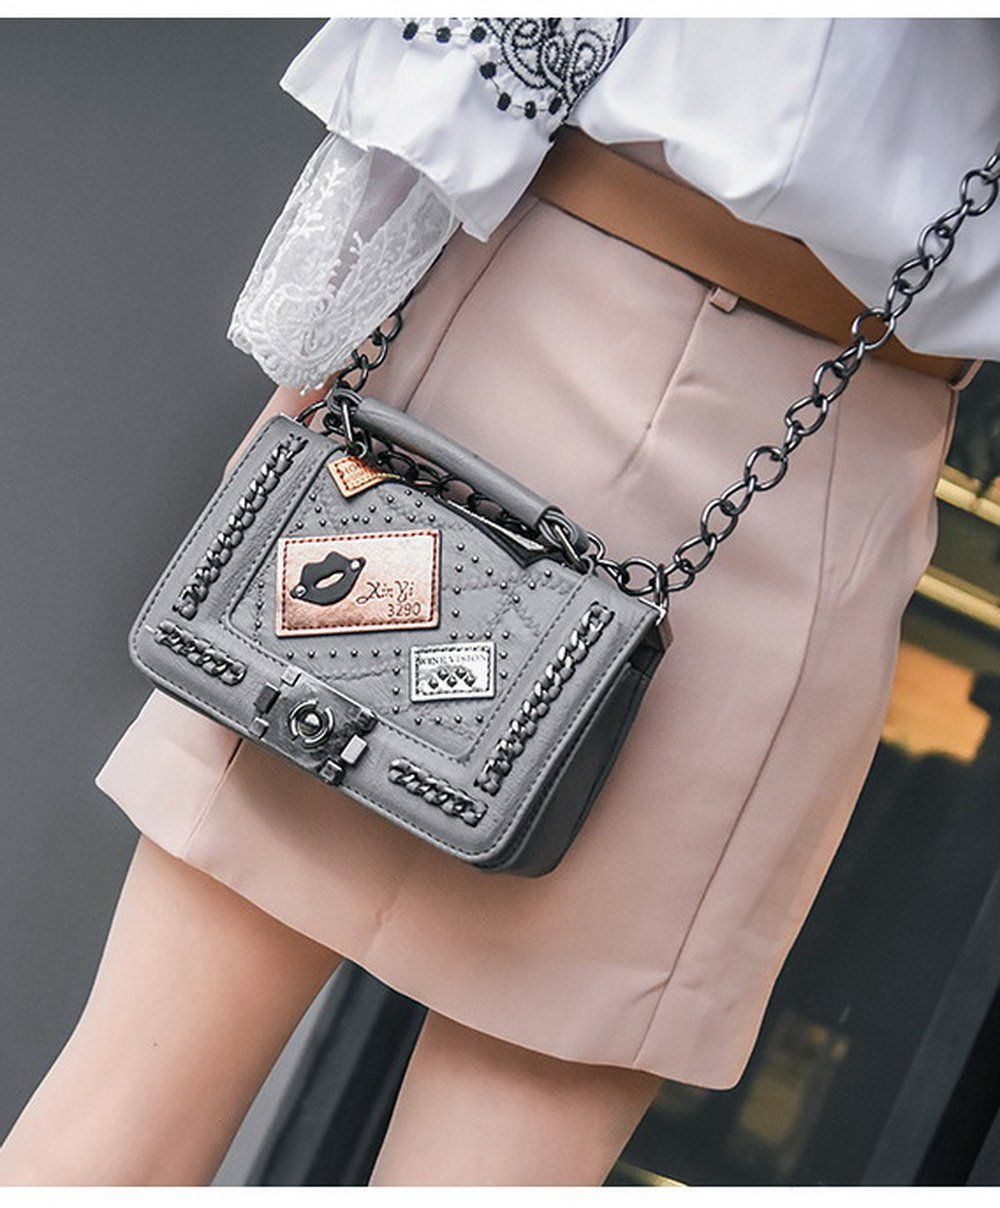 Designer Vintage Rivet Lock Bag  076ae5c21c0d